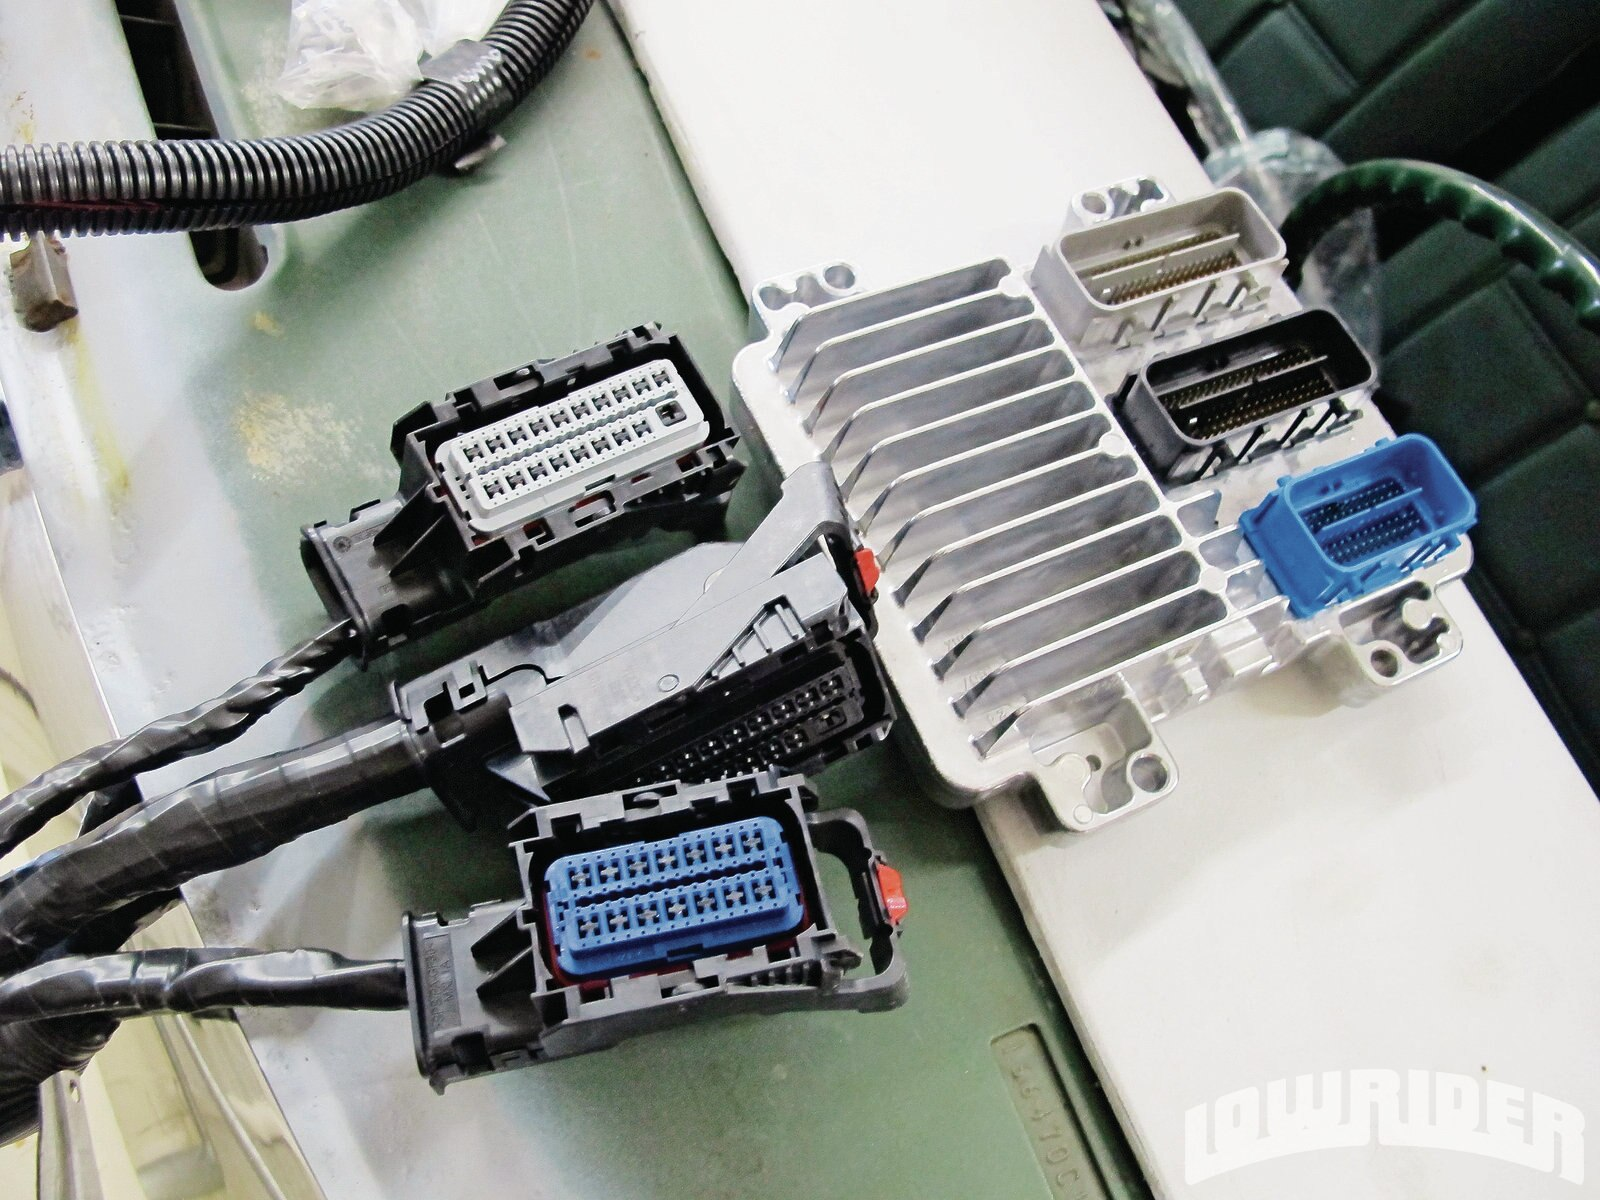 hight resolution of 1204 lrmp 25 o gm performance ls3 harness and engine computer lowrider rh lowrider com lq9 wiring harness diagram ls3 engine harness